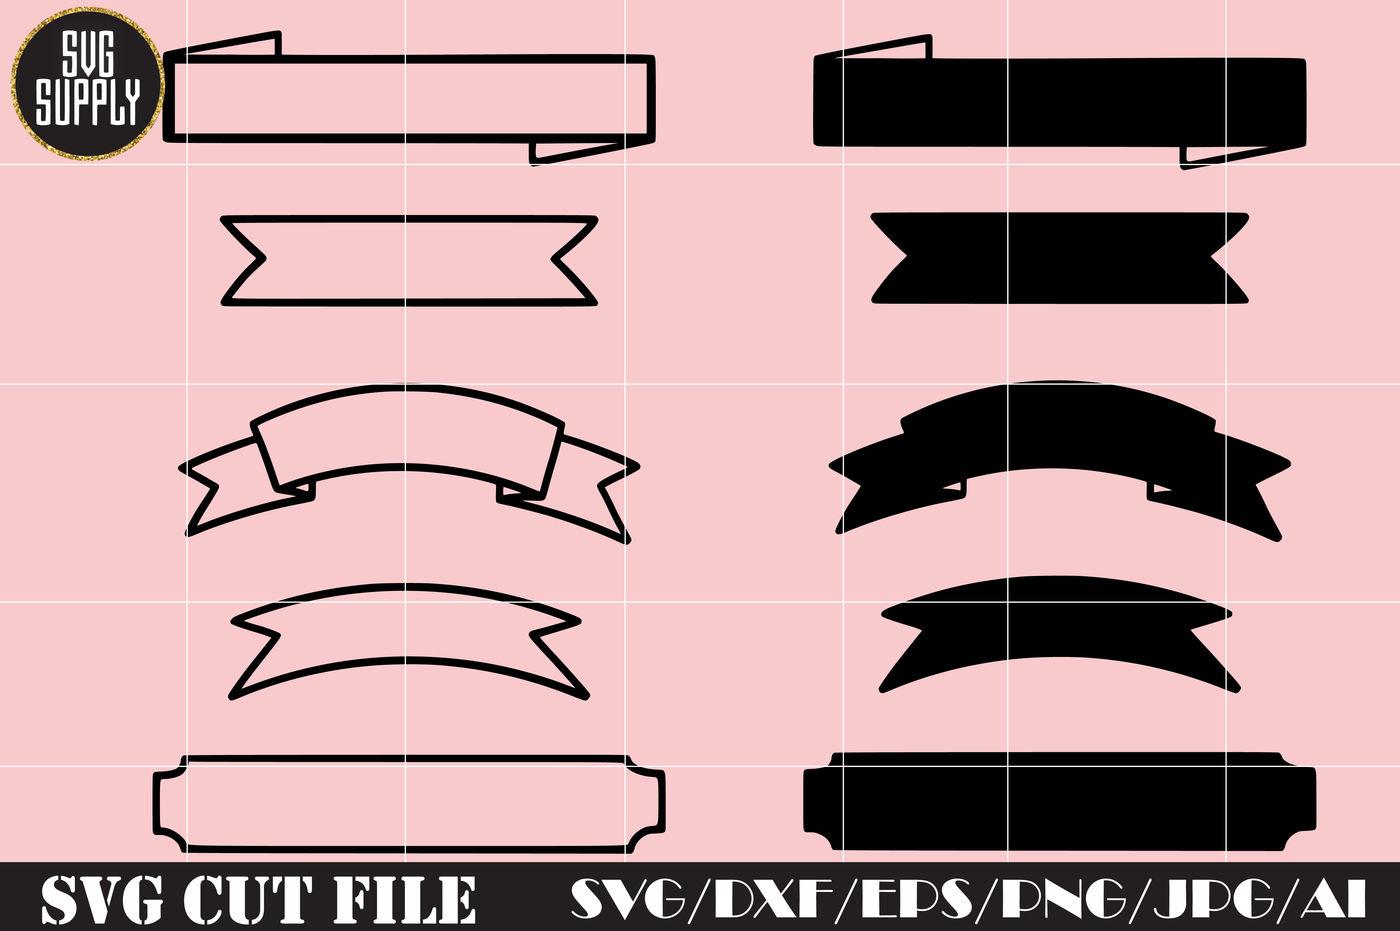 Embellishment Banner Svg Cut File By Svgsupply Thehungryjpeg Com